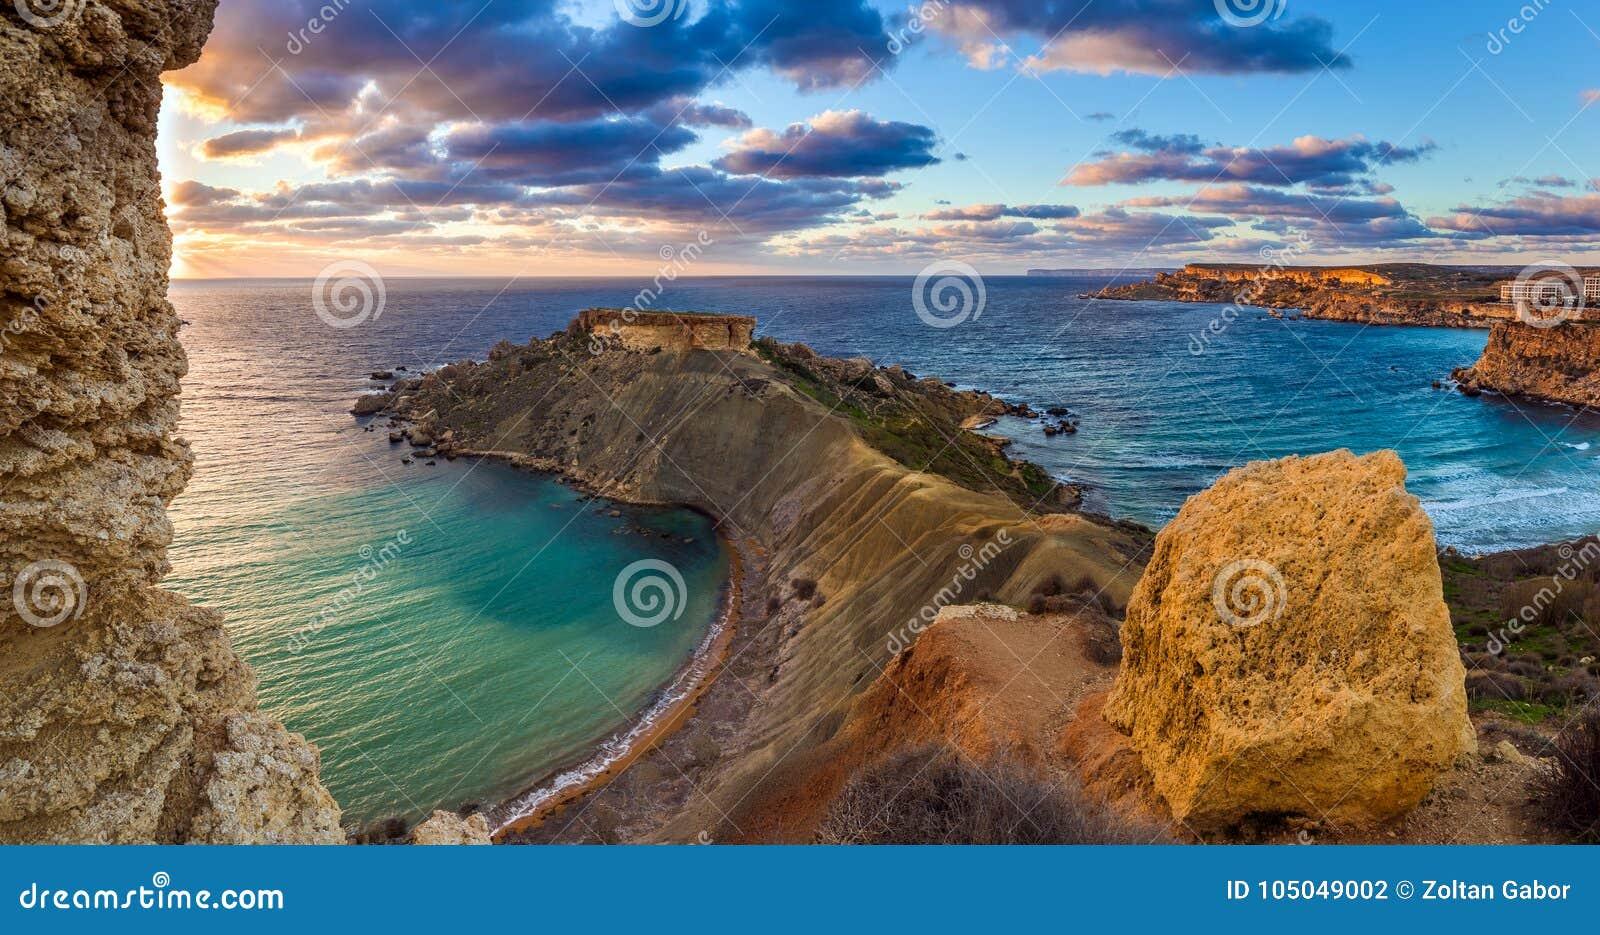 Mgarr, Μάλτα - πανόραμα του κόλπου Gnejna και Ghajn Tuffieha, η ομορφότερη παραλία δύο στη Μάλτα στο ηλιοβασίλεμα